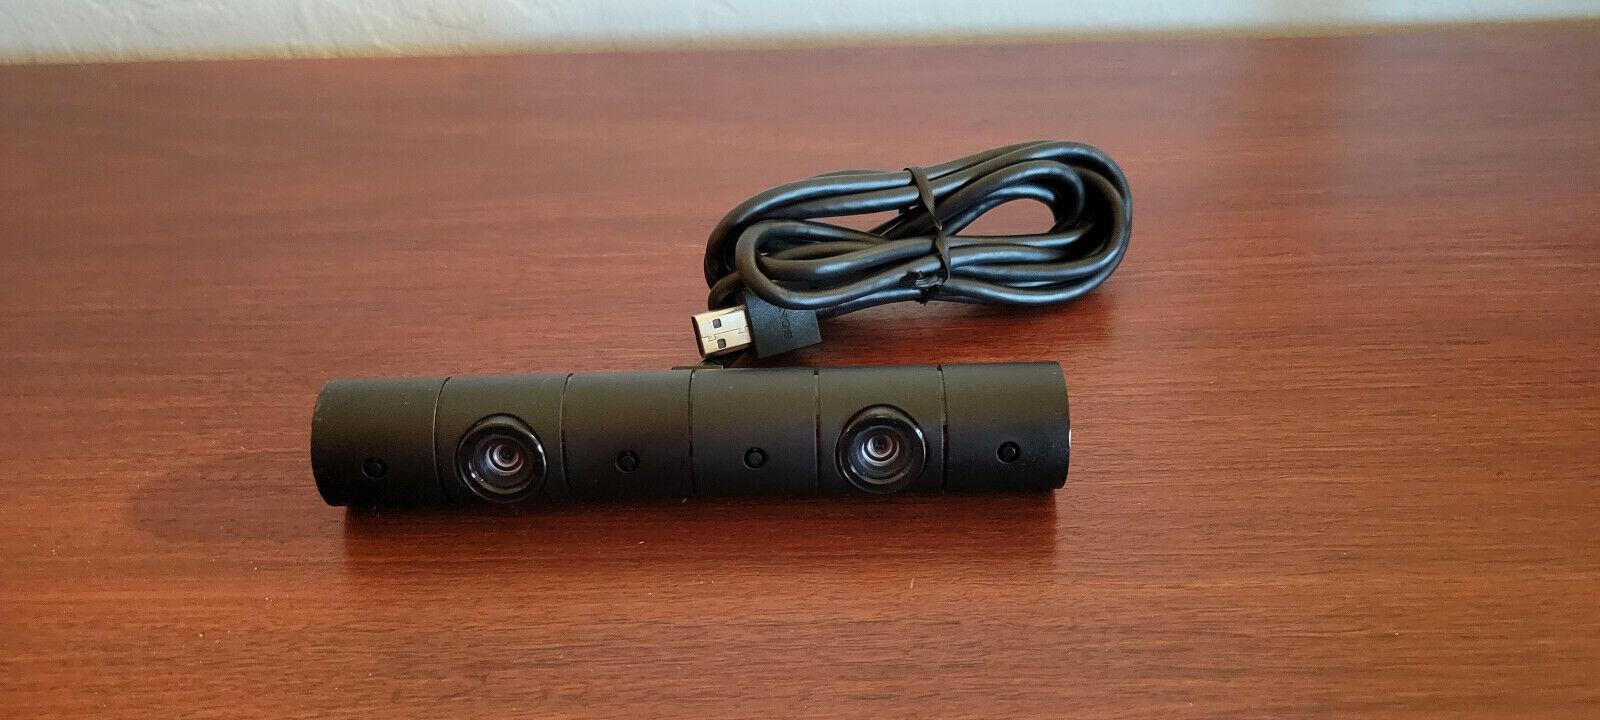 Sony PlayStation 4 - Original Camera - Black